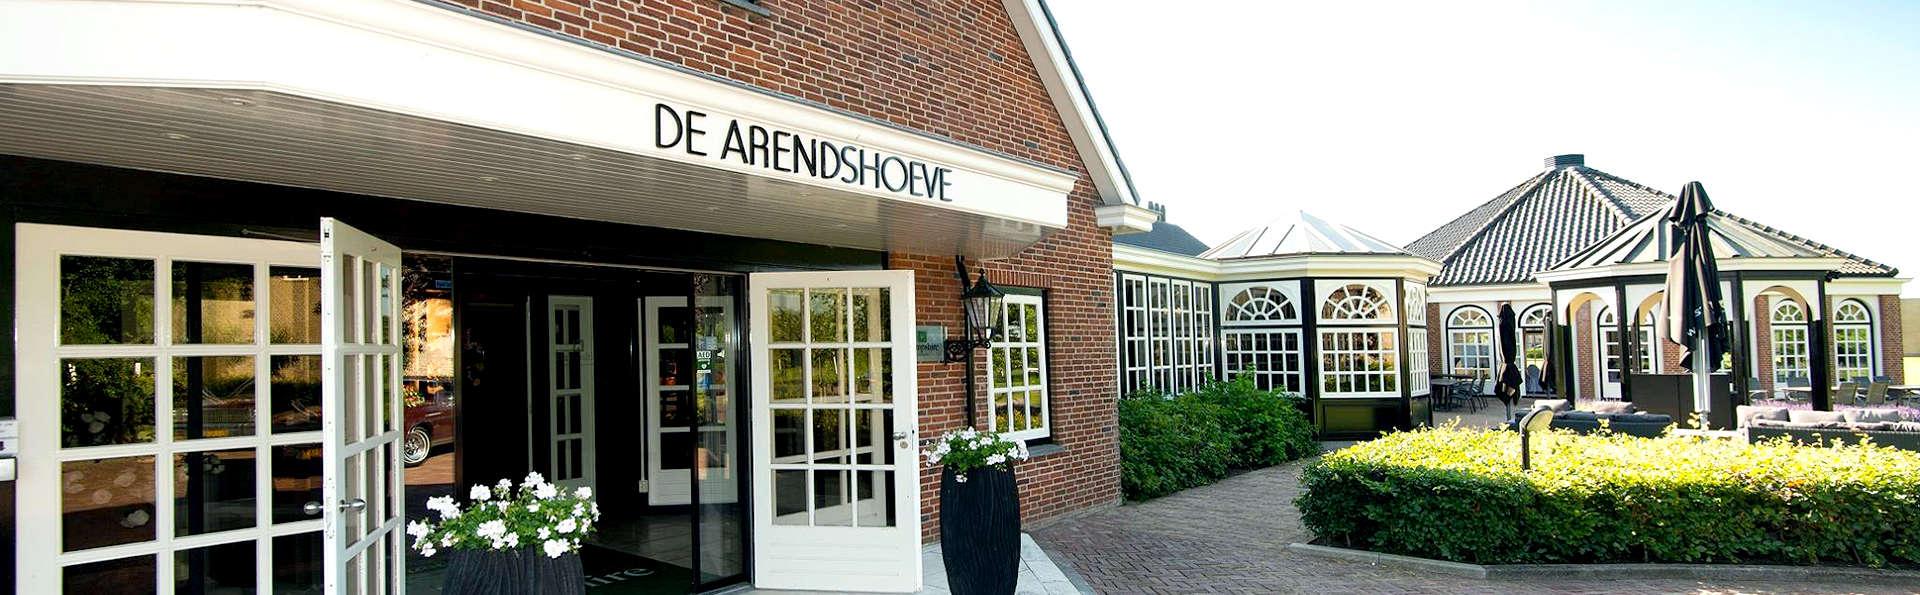 De Arendshoeve - Hotel & Restaurant - Edit_Front2.jpg